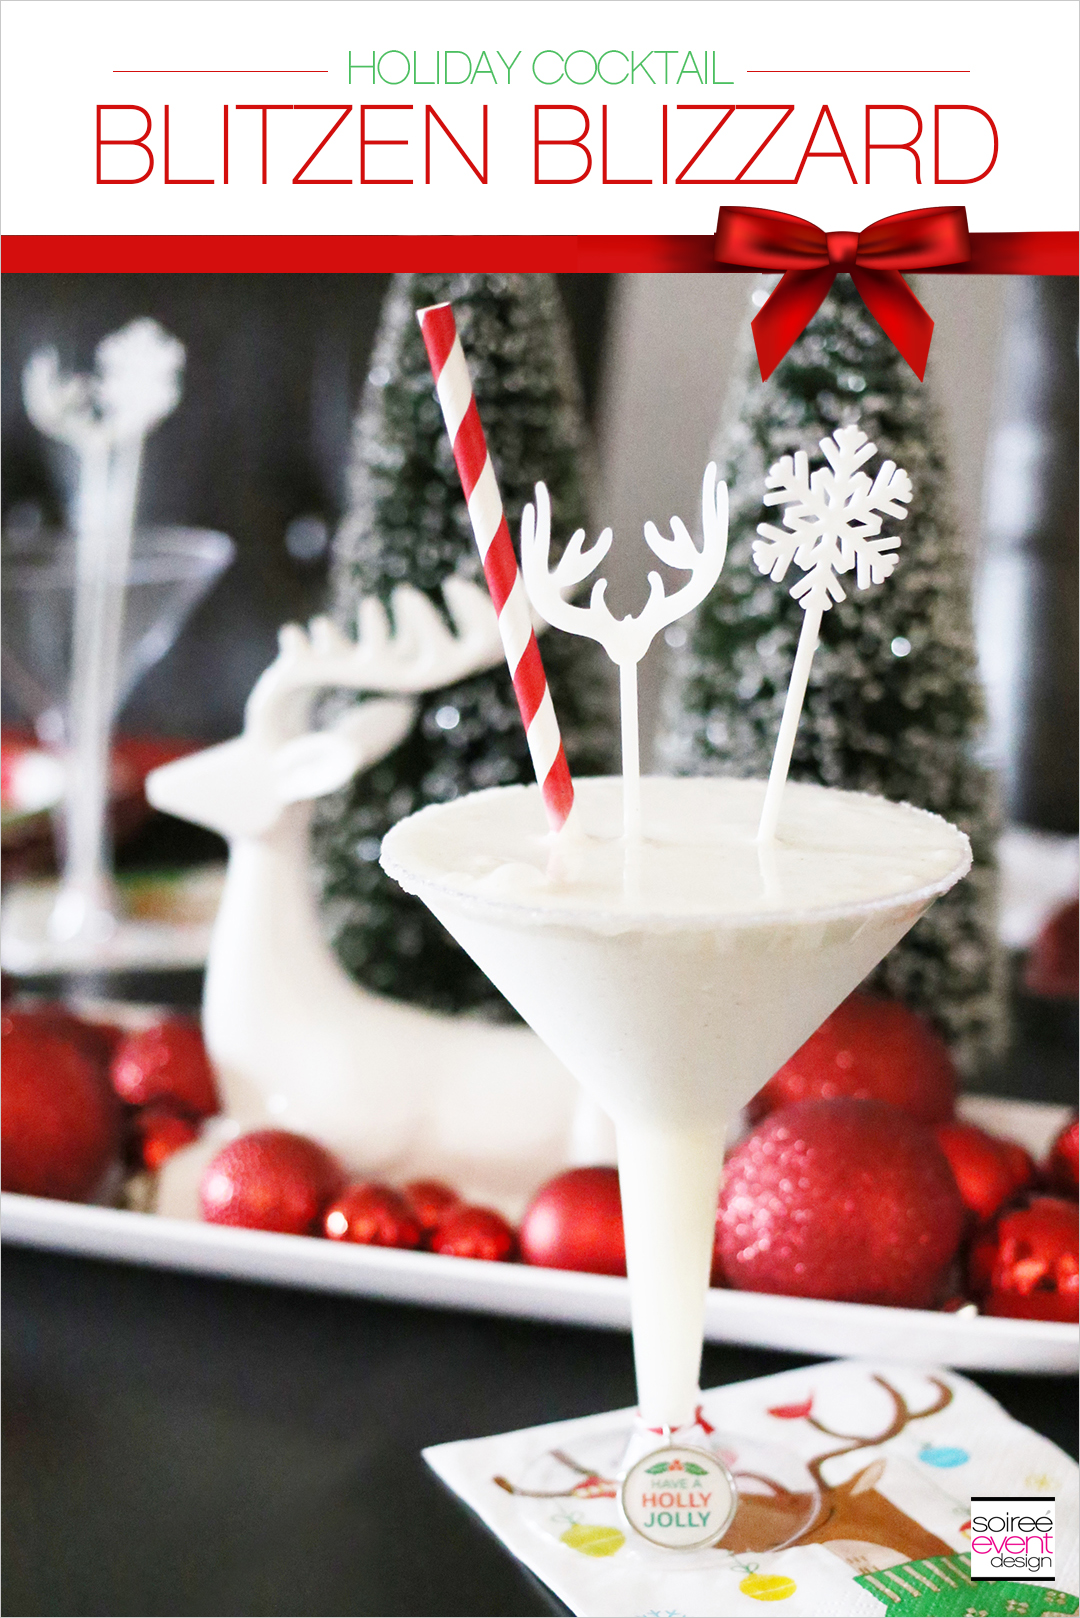 Holiday Cocktails, Blitzen Blizzard